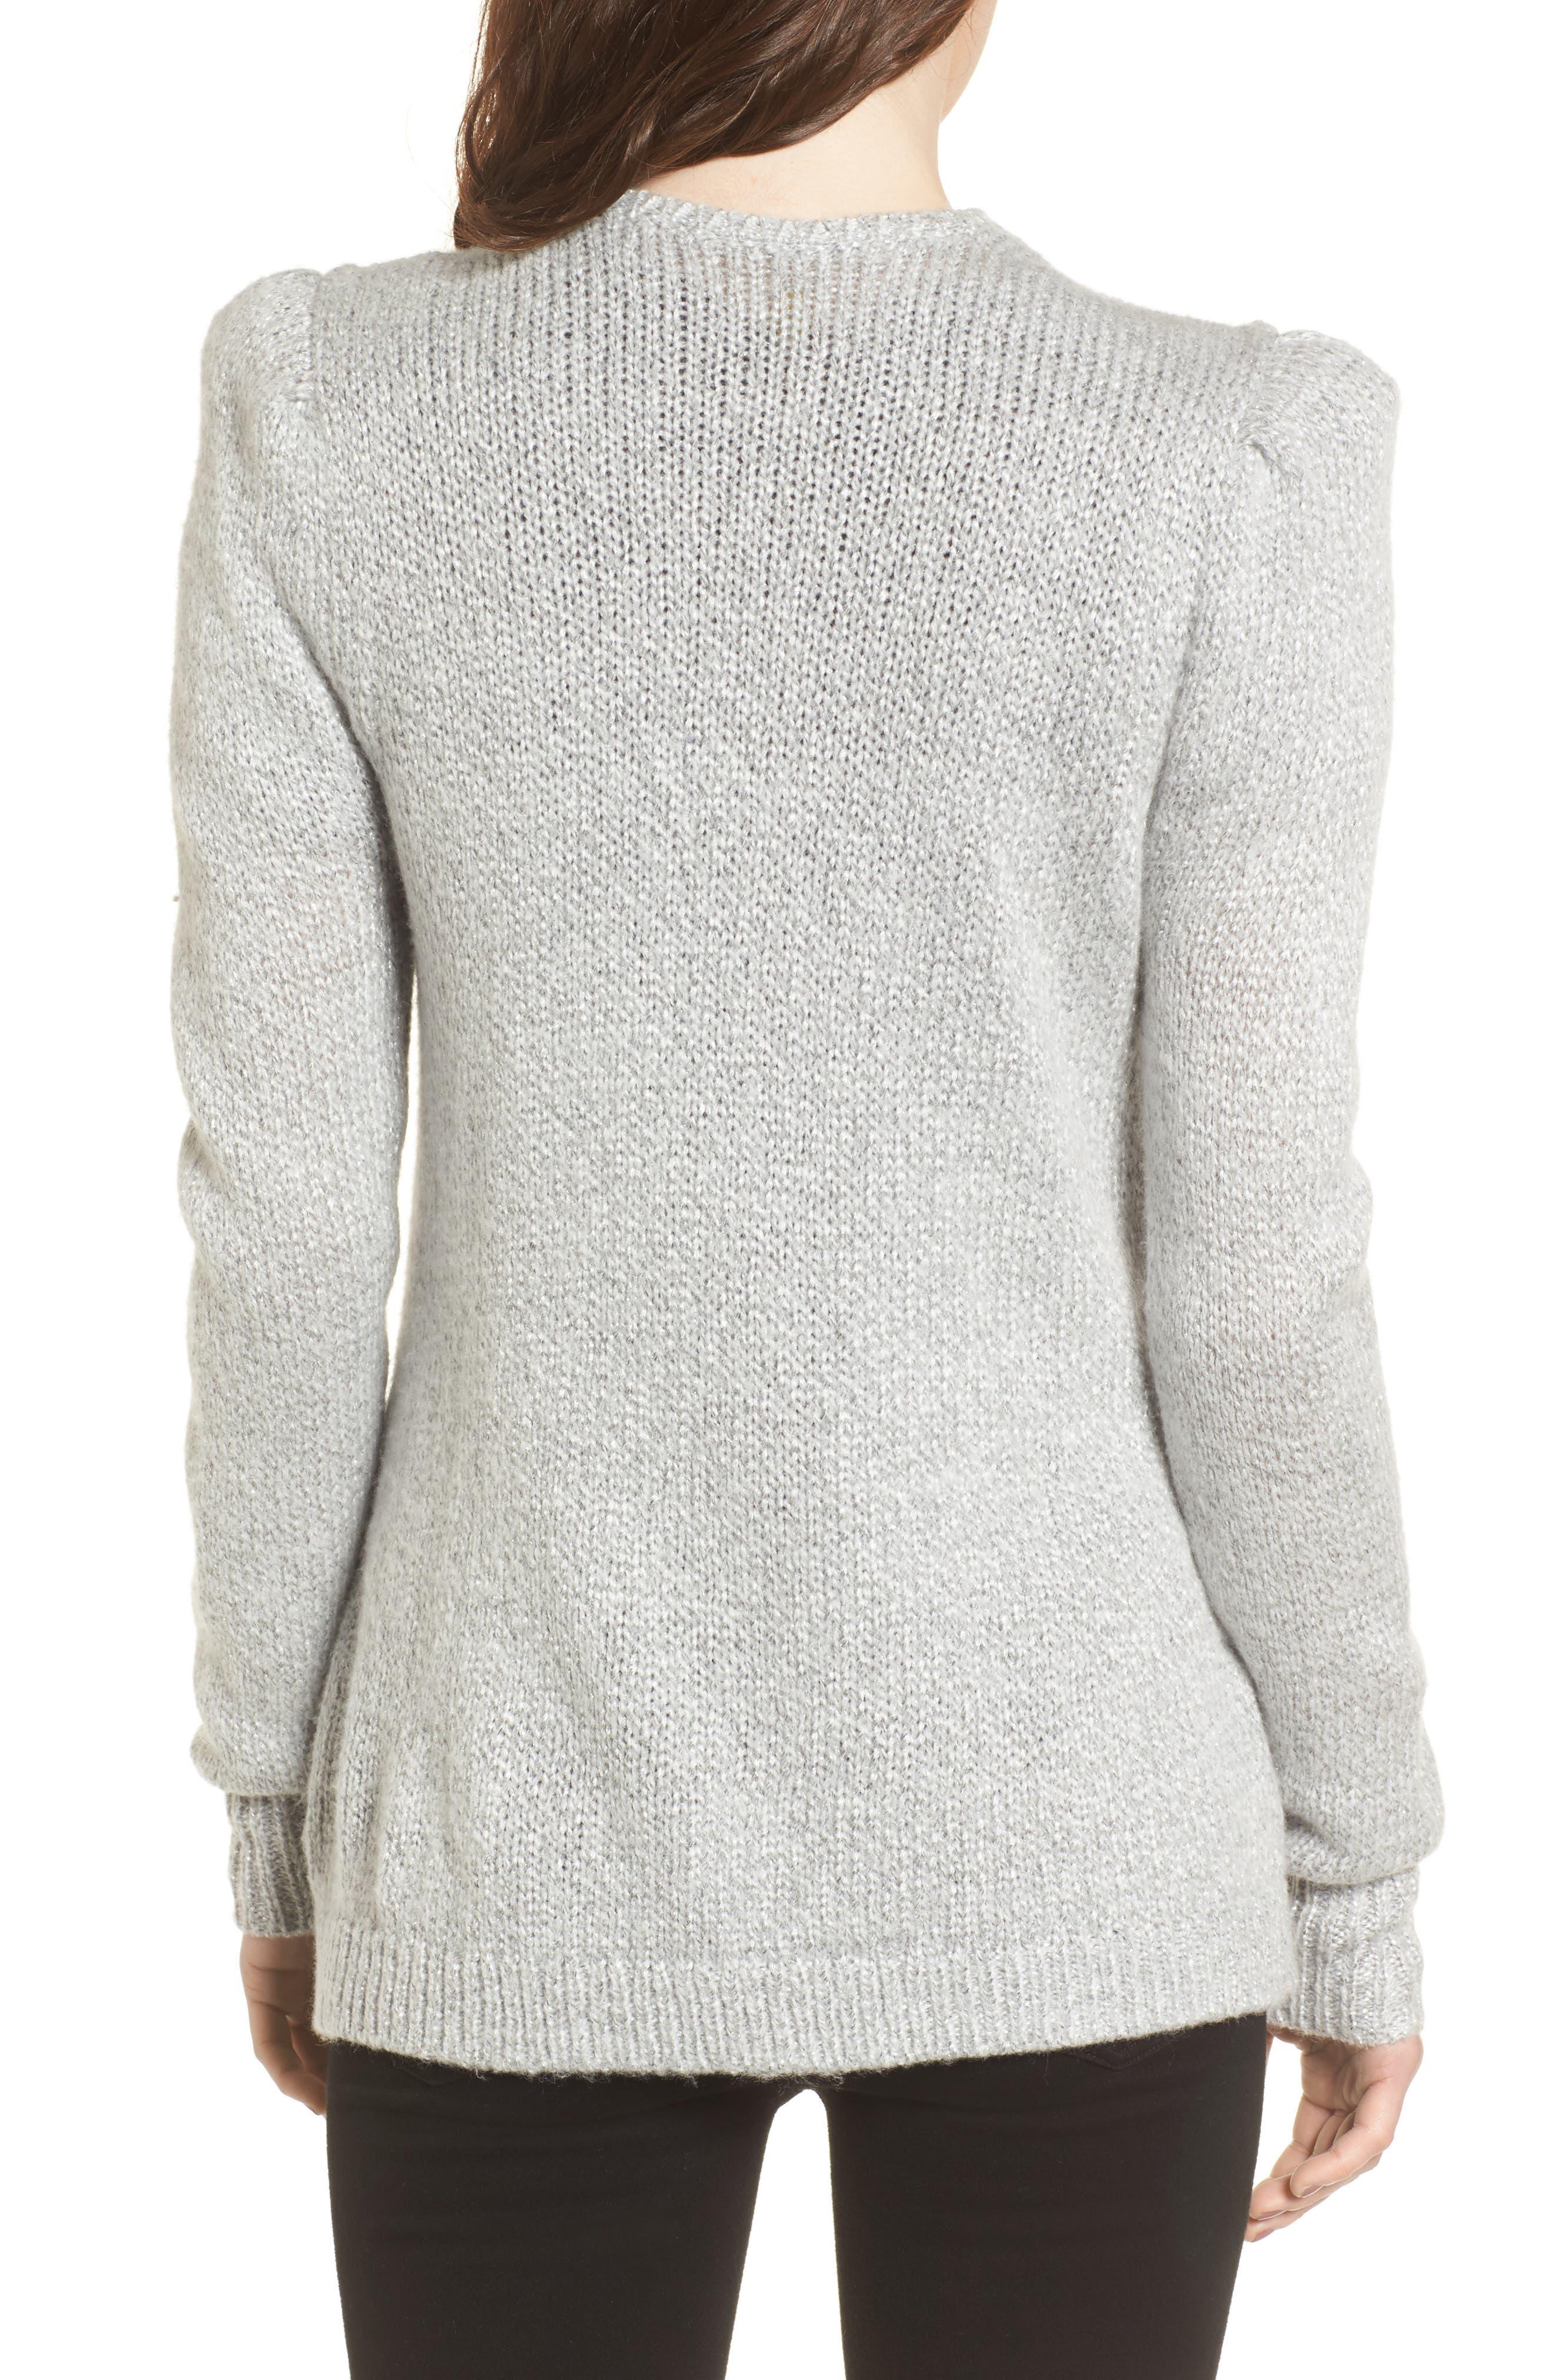 Shine Cardigan Sweater,                             Alternate thumbnail 2, color,                             020